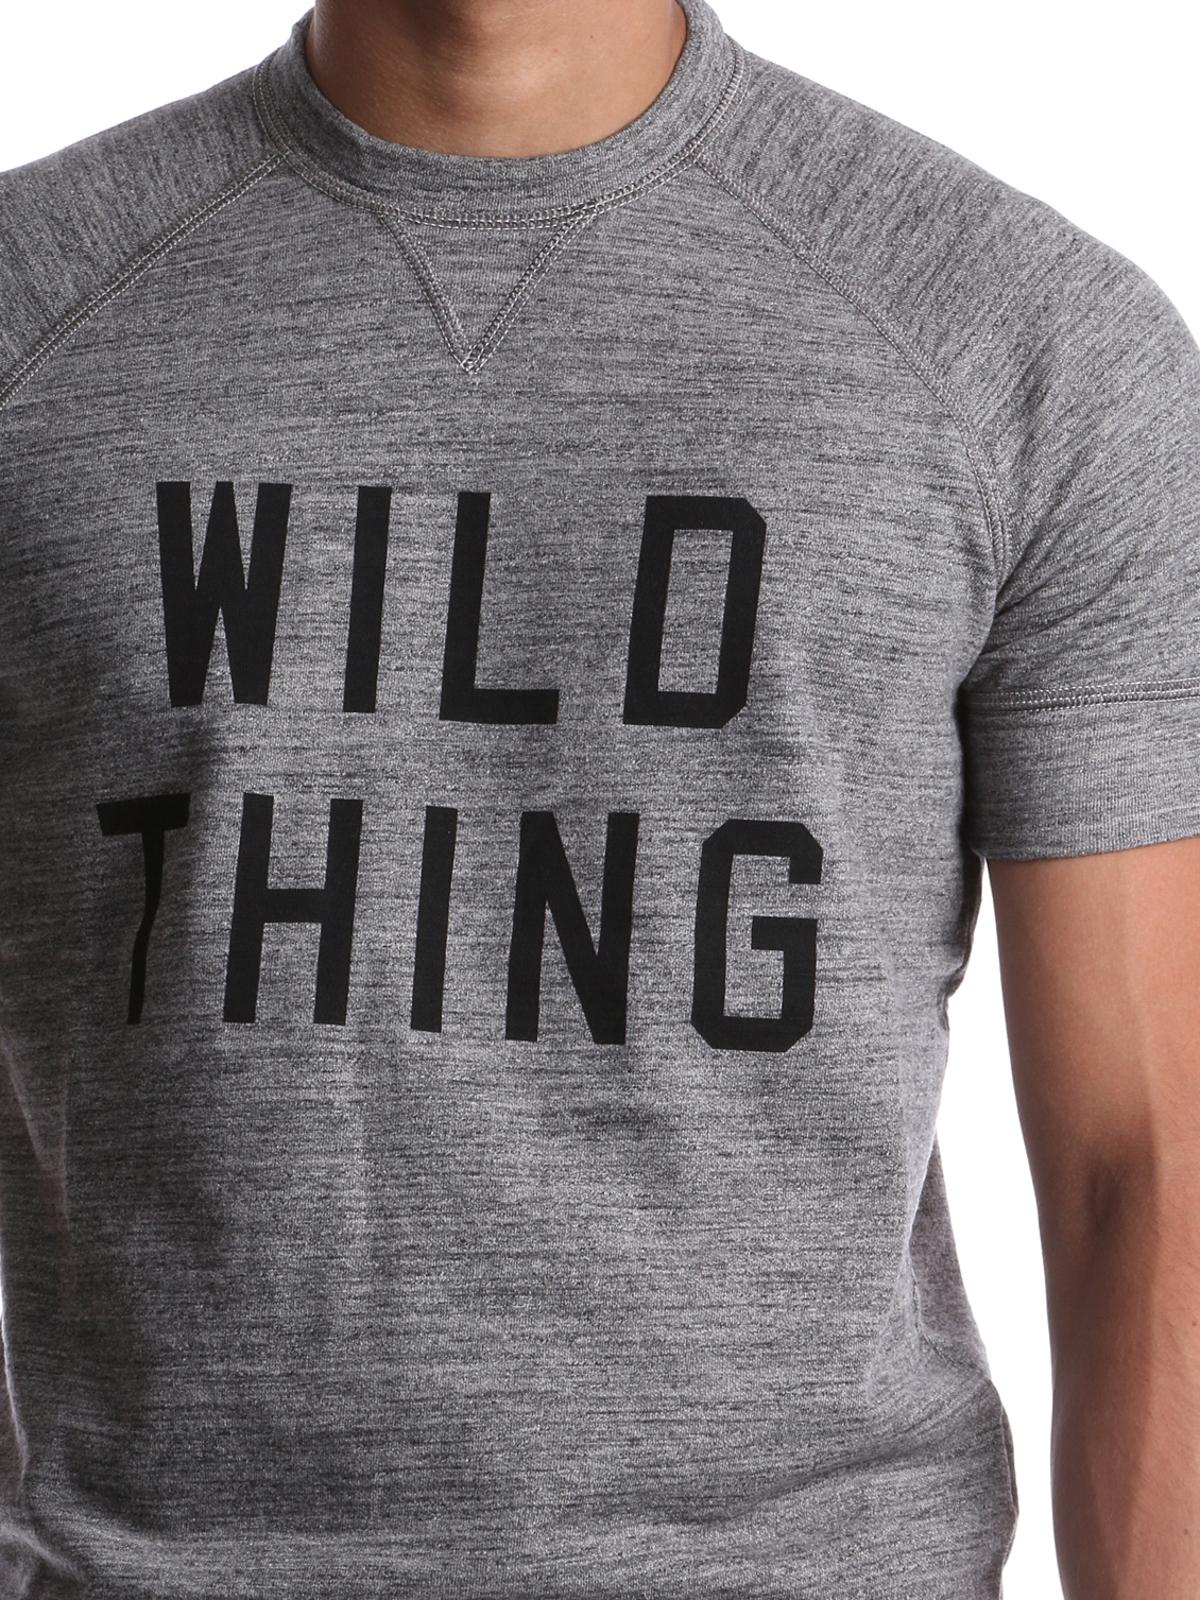 ac767d44ded2 Dsquared2 - Wild Thing sweatshirt - Sweatshirts   Sweaters ...